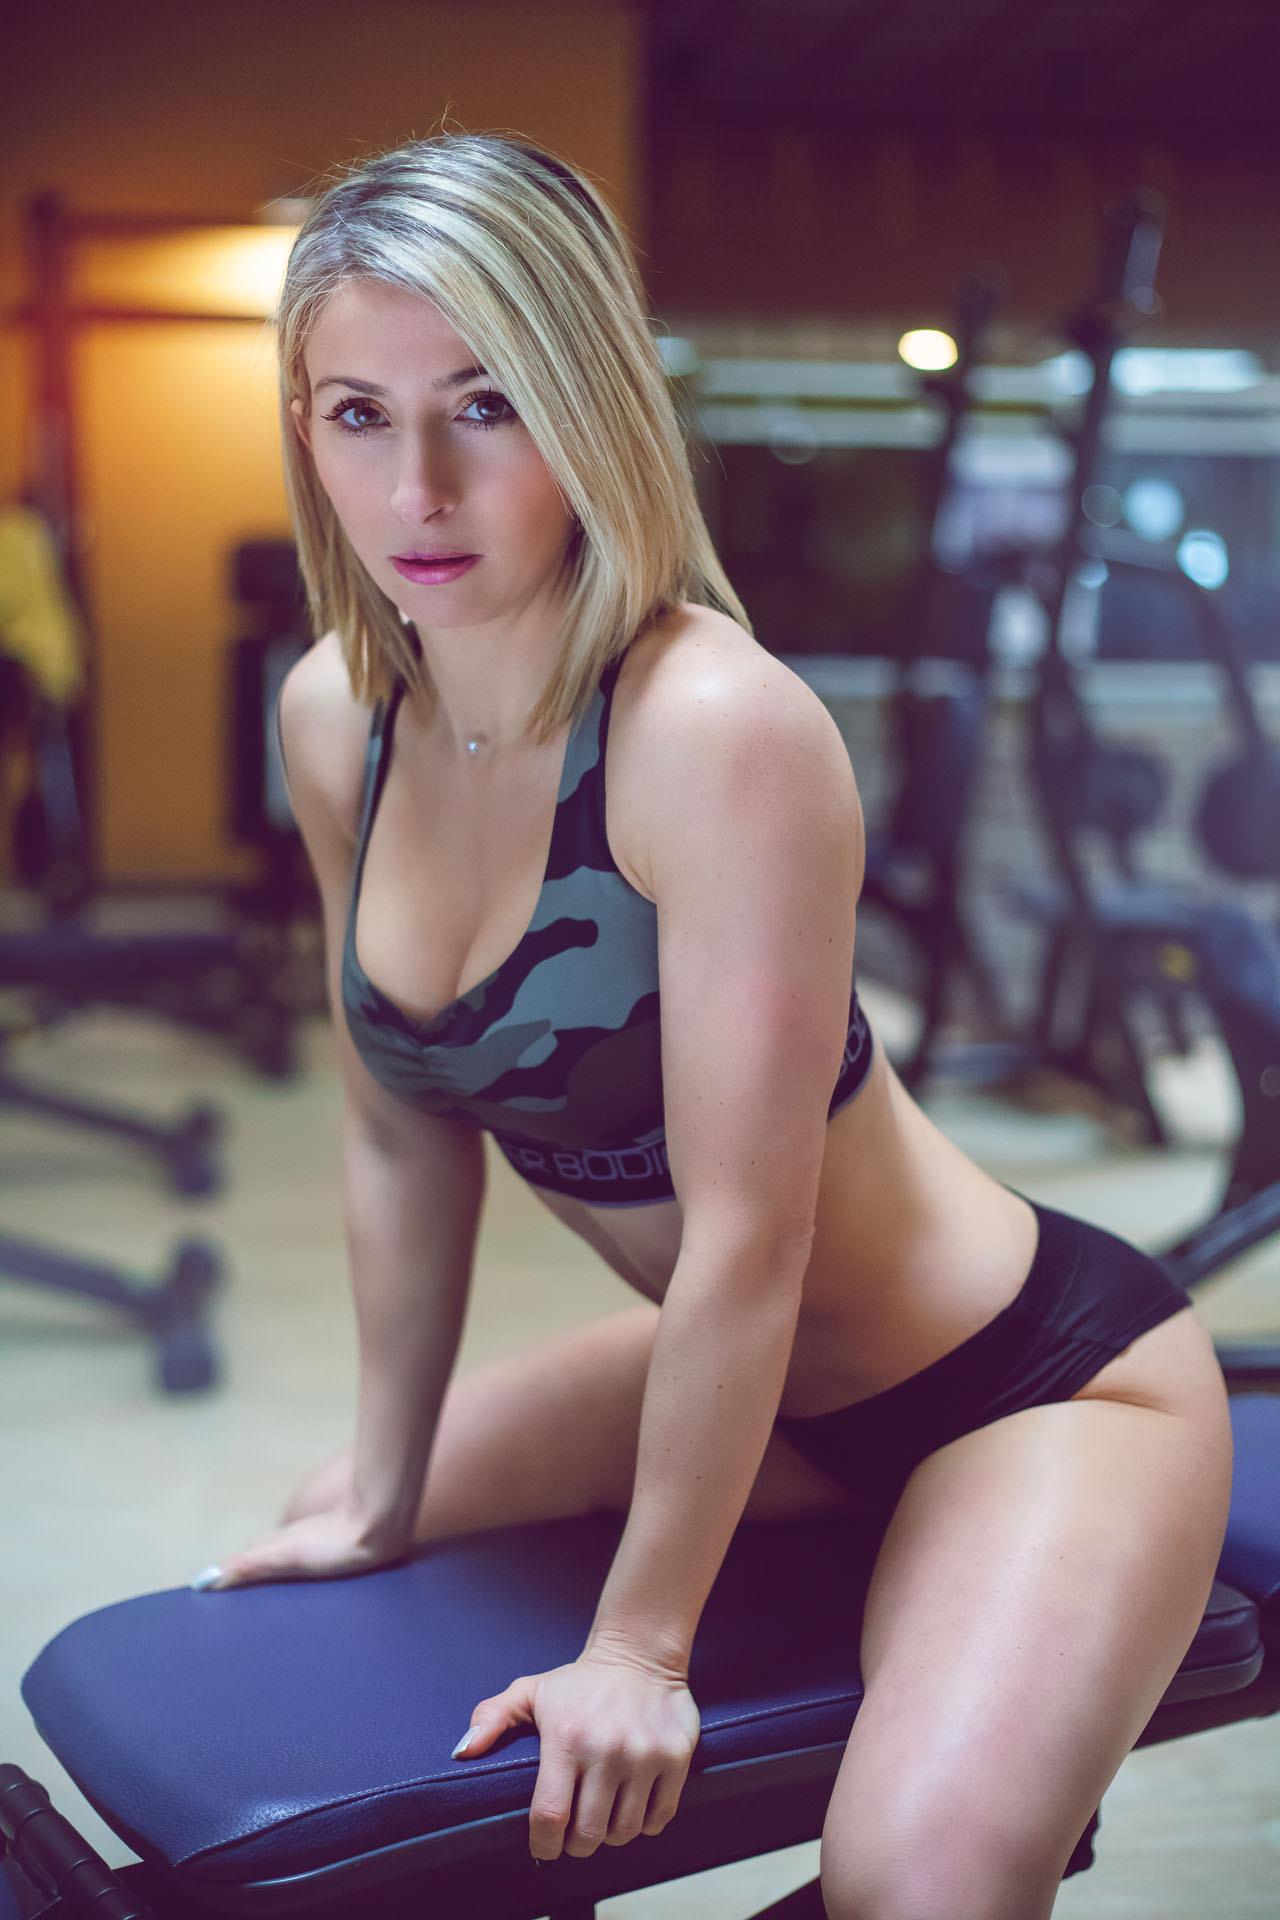 2017-03-02 - Jess Combes - ParadiForm - 3505 - 1920px